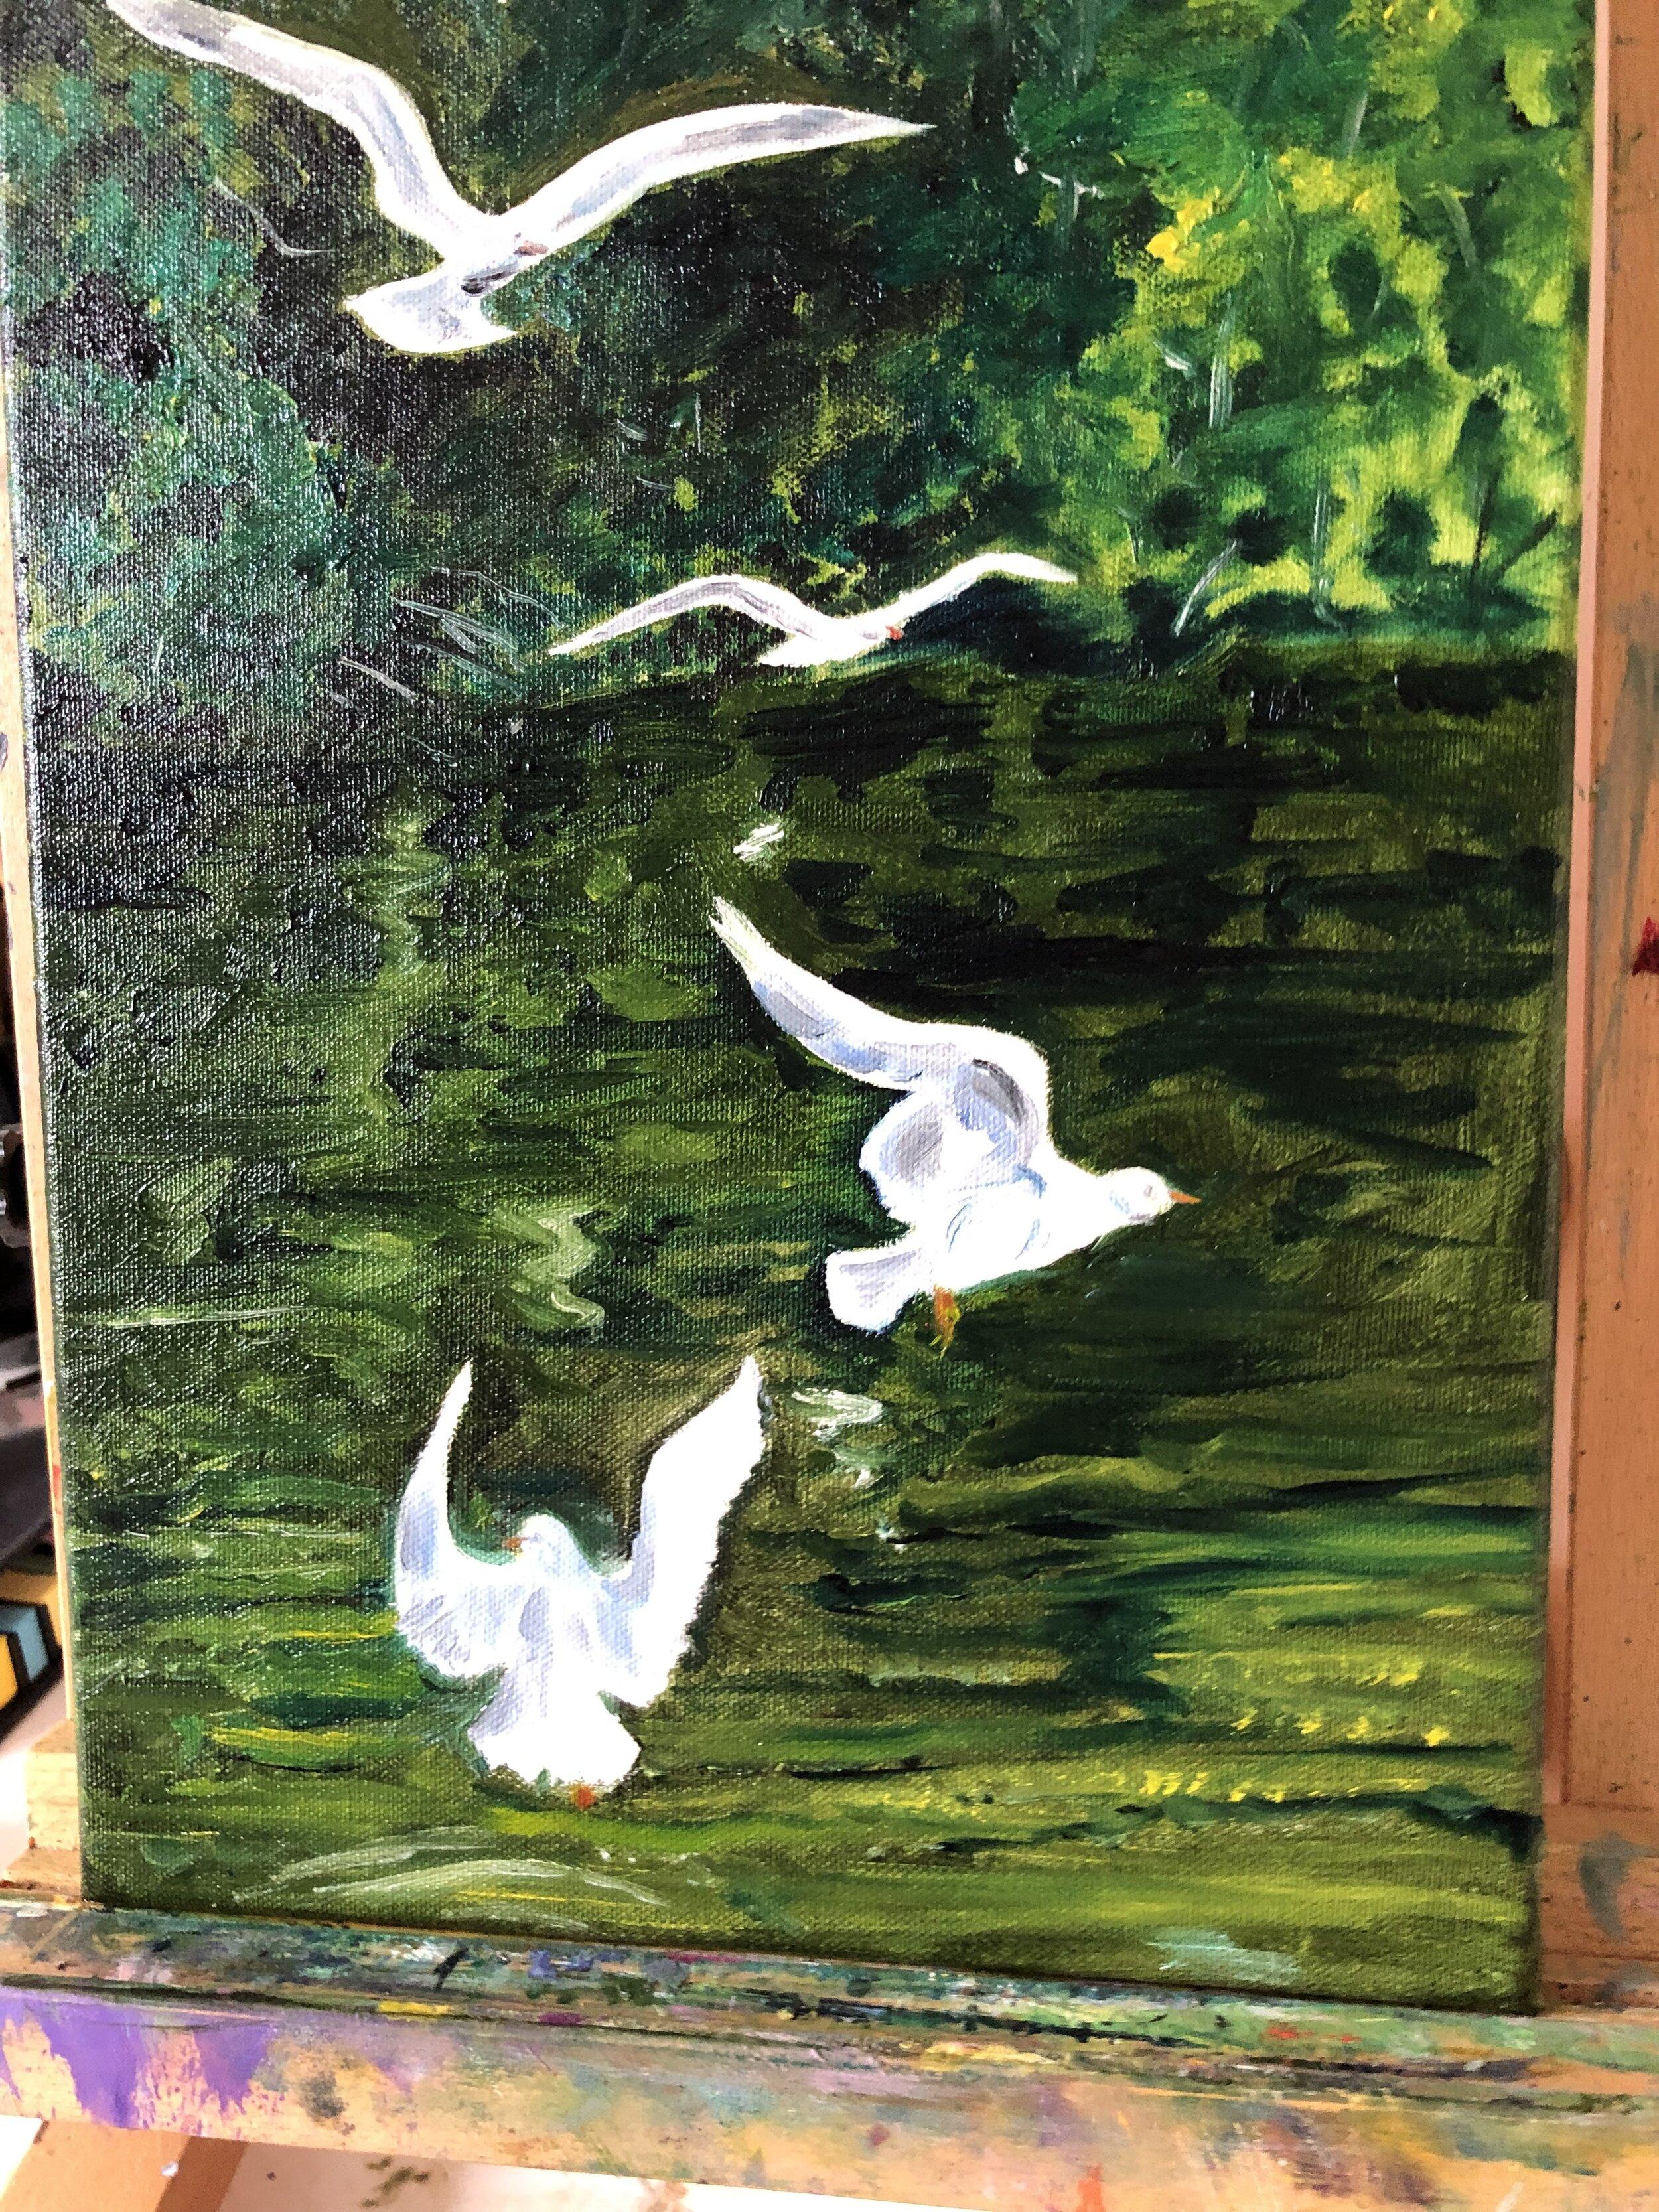 Seagulls on Kennet & Avon Canal